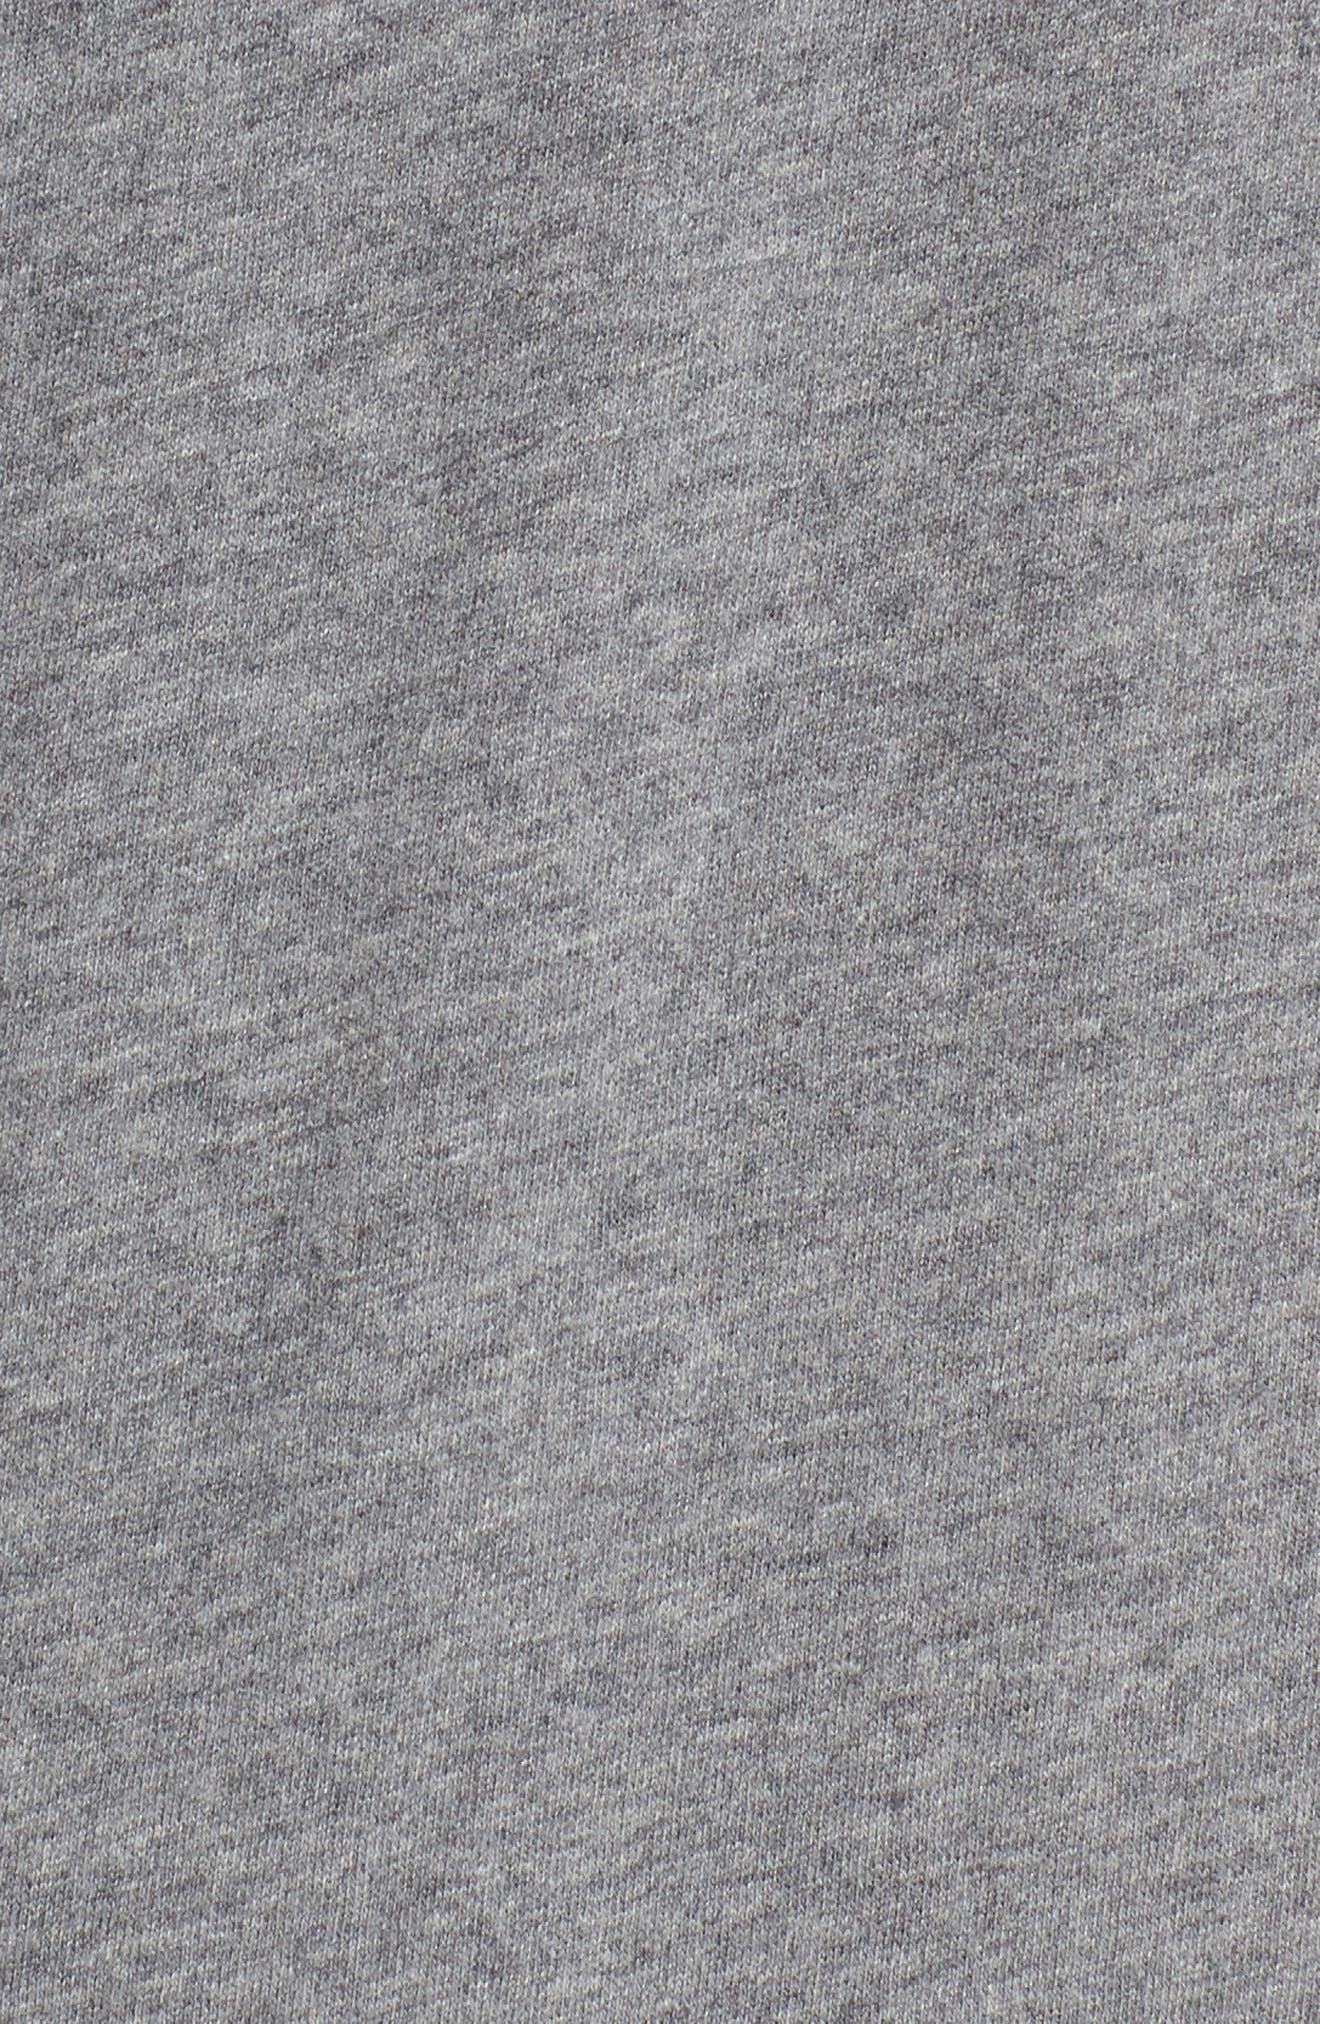 Solidarity Slim Fit Crewneck T-Shirt,                             Alternate thumbnail 5, color,                             Mid Grey Melange/ Black